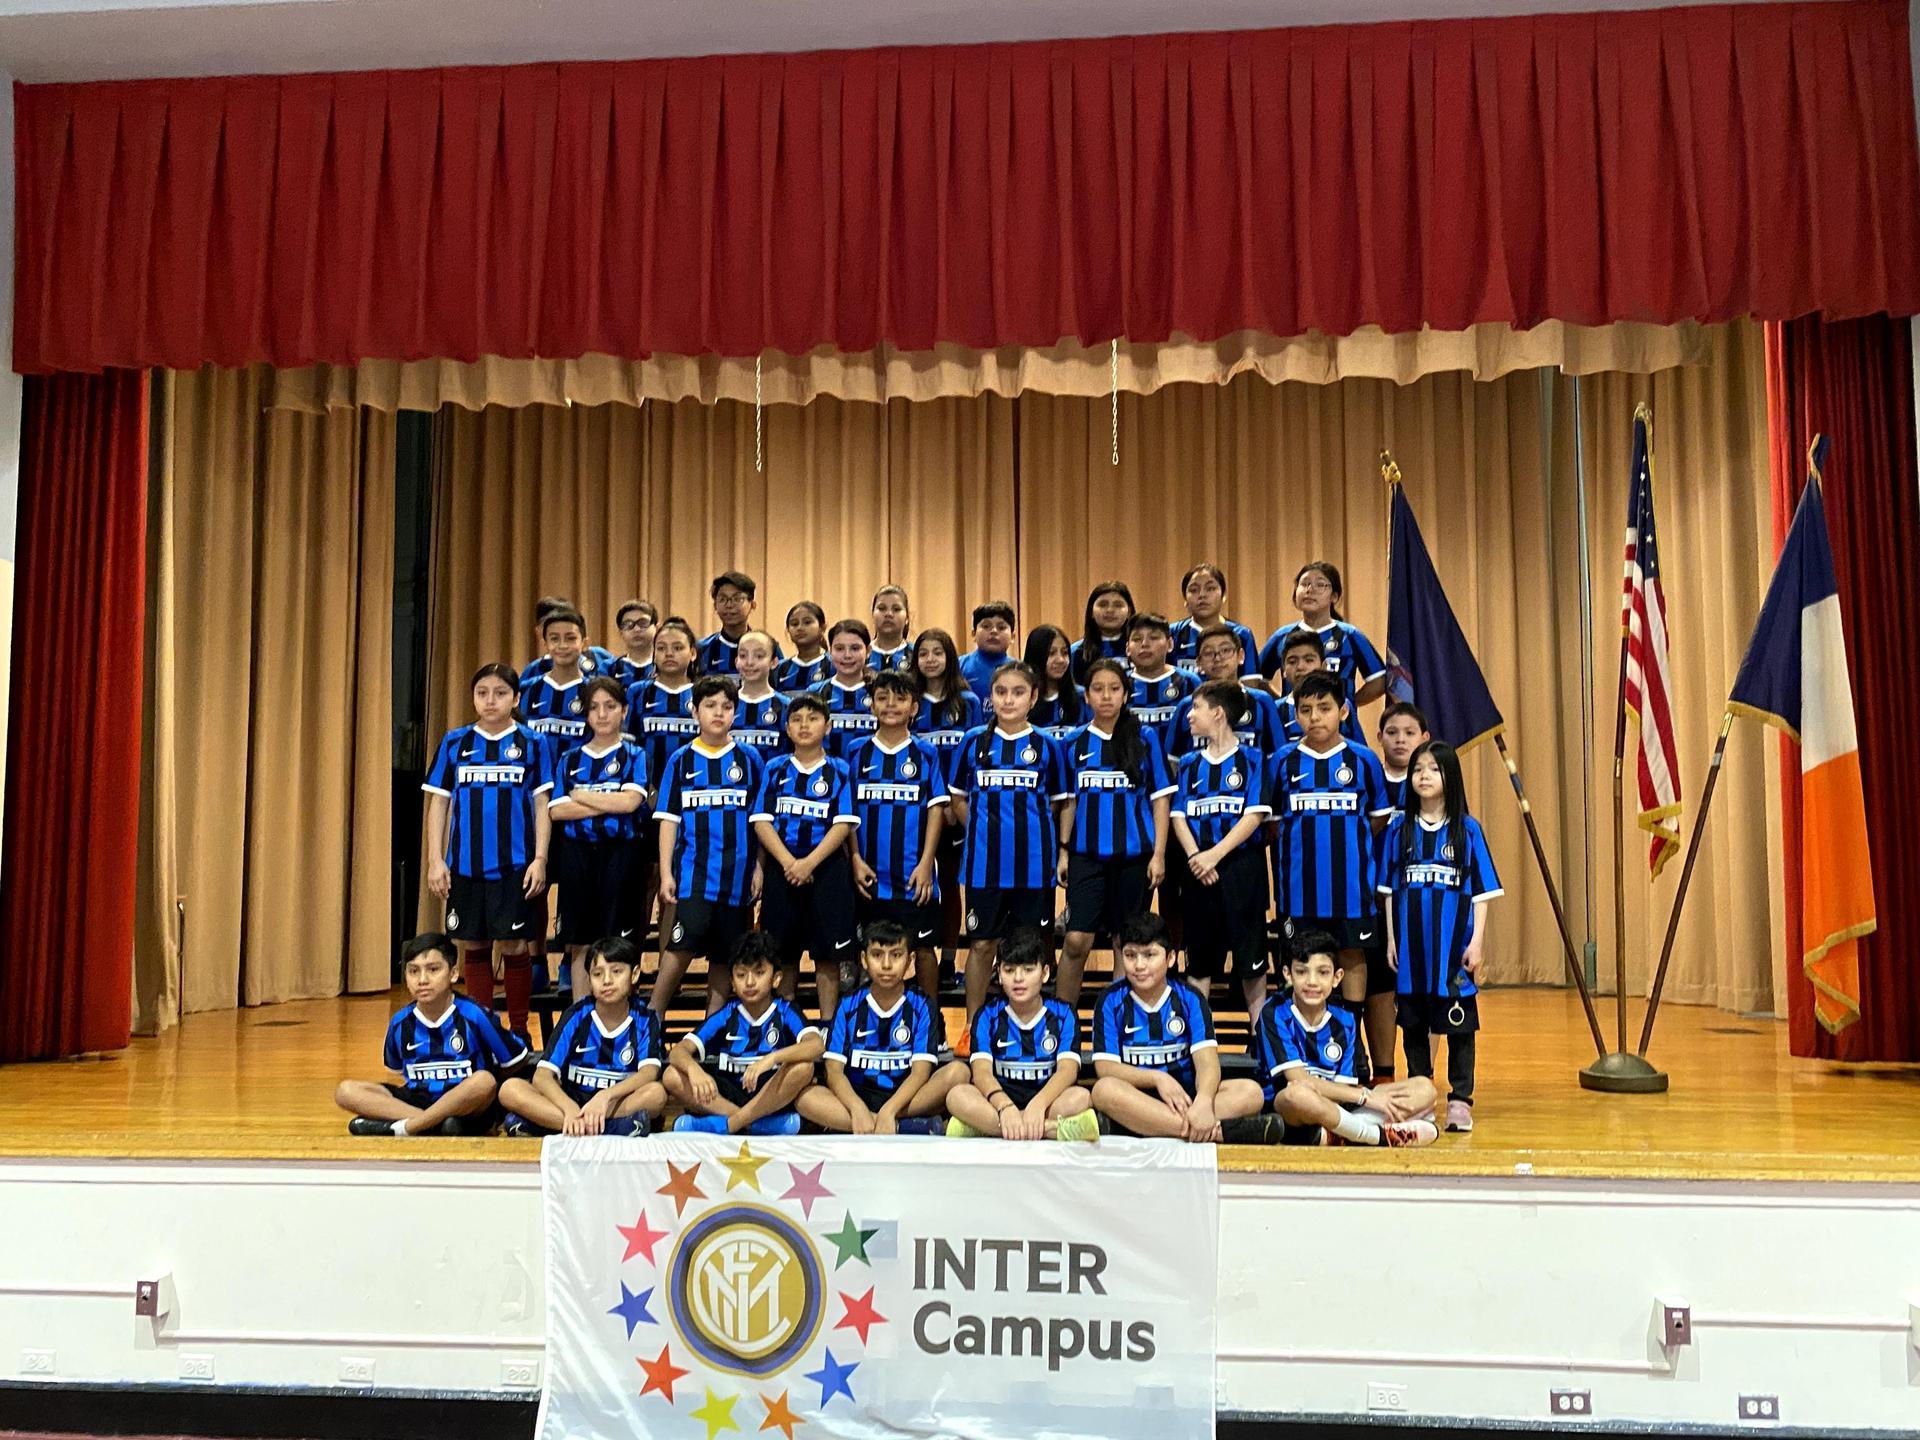 Inter Campus Soccer - Athletics - Magnet School of ...